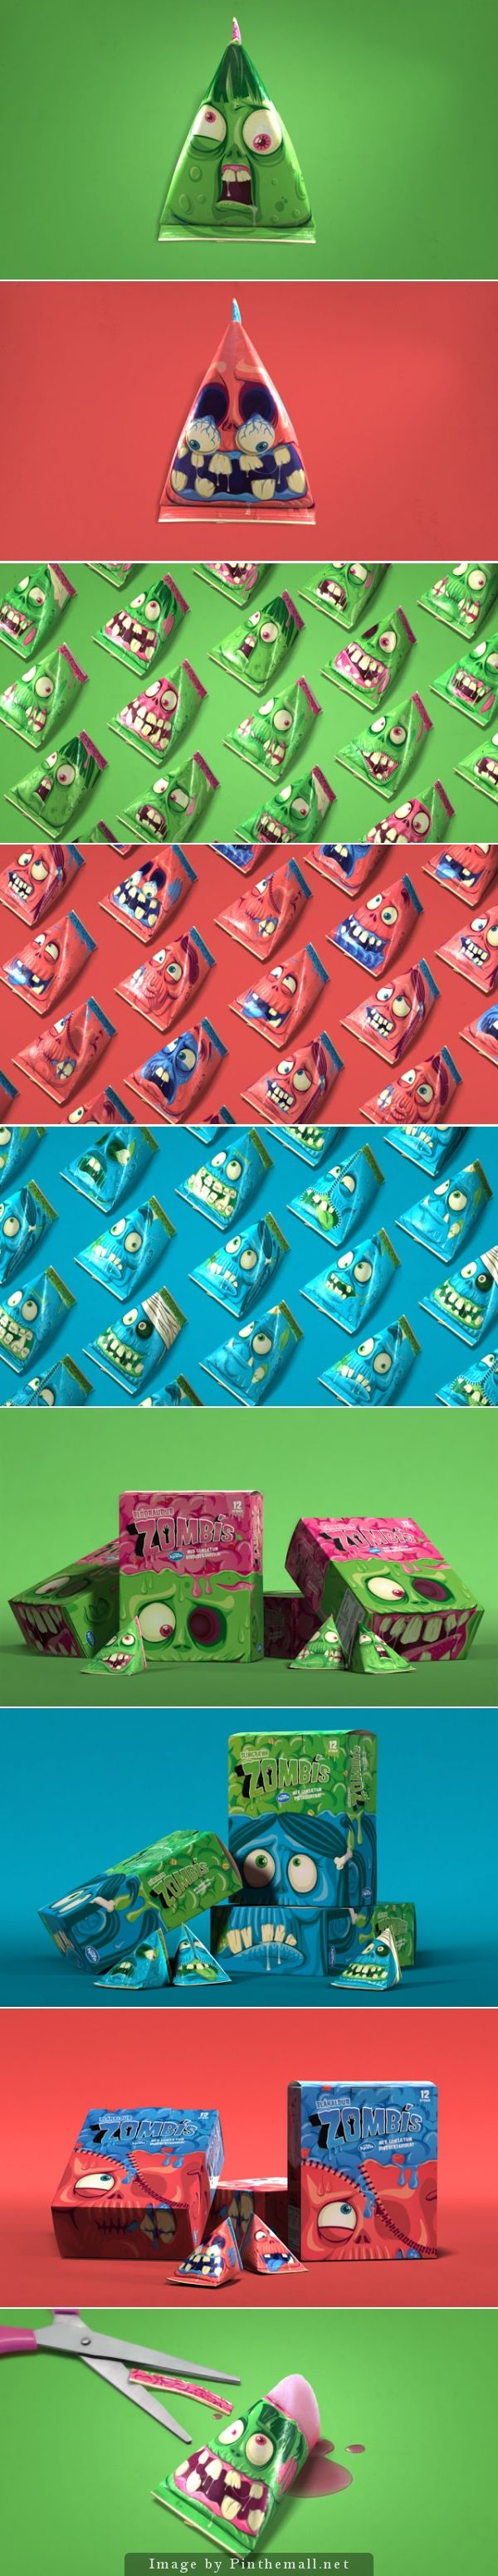 Zombis Freezer Pops #packaging by Brandenburg - http://www.packagingoftheworld.com/2014/10/zombis-freezer-pops.html